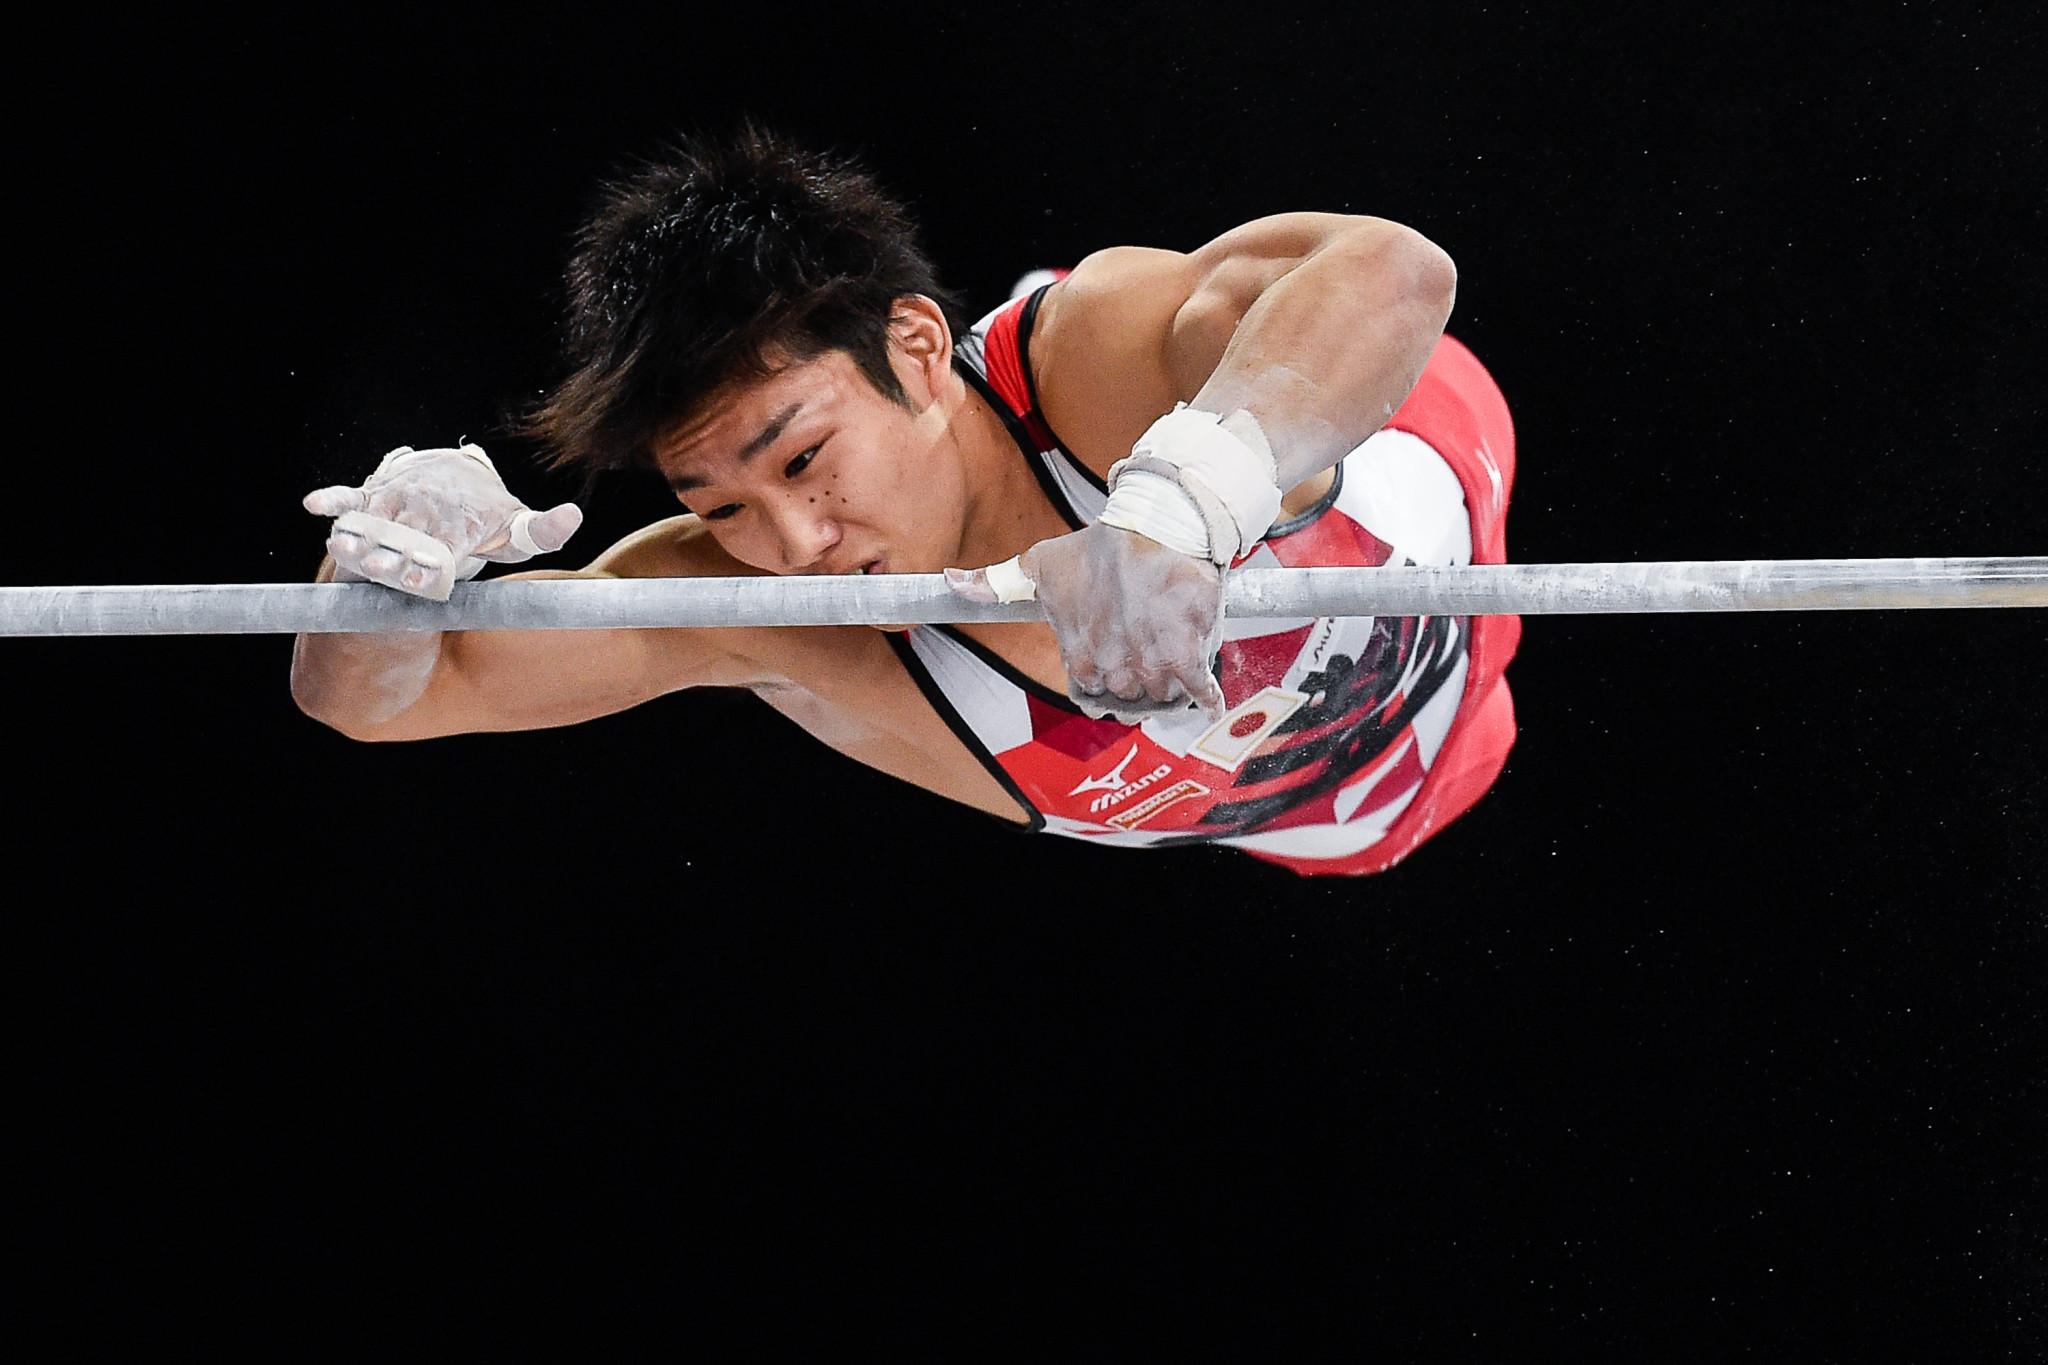 Hidetaka Miyachi topped men's horizontal bar qualification ©Getty Images